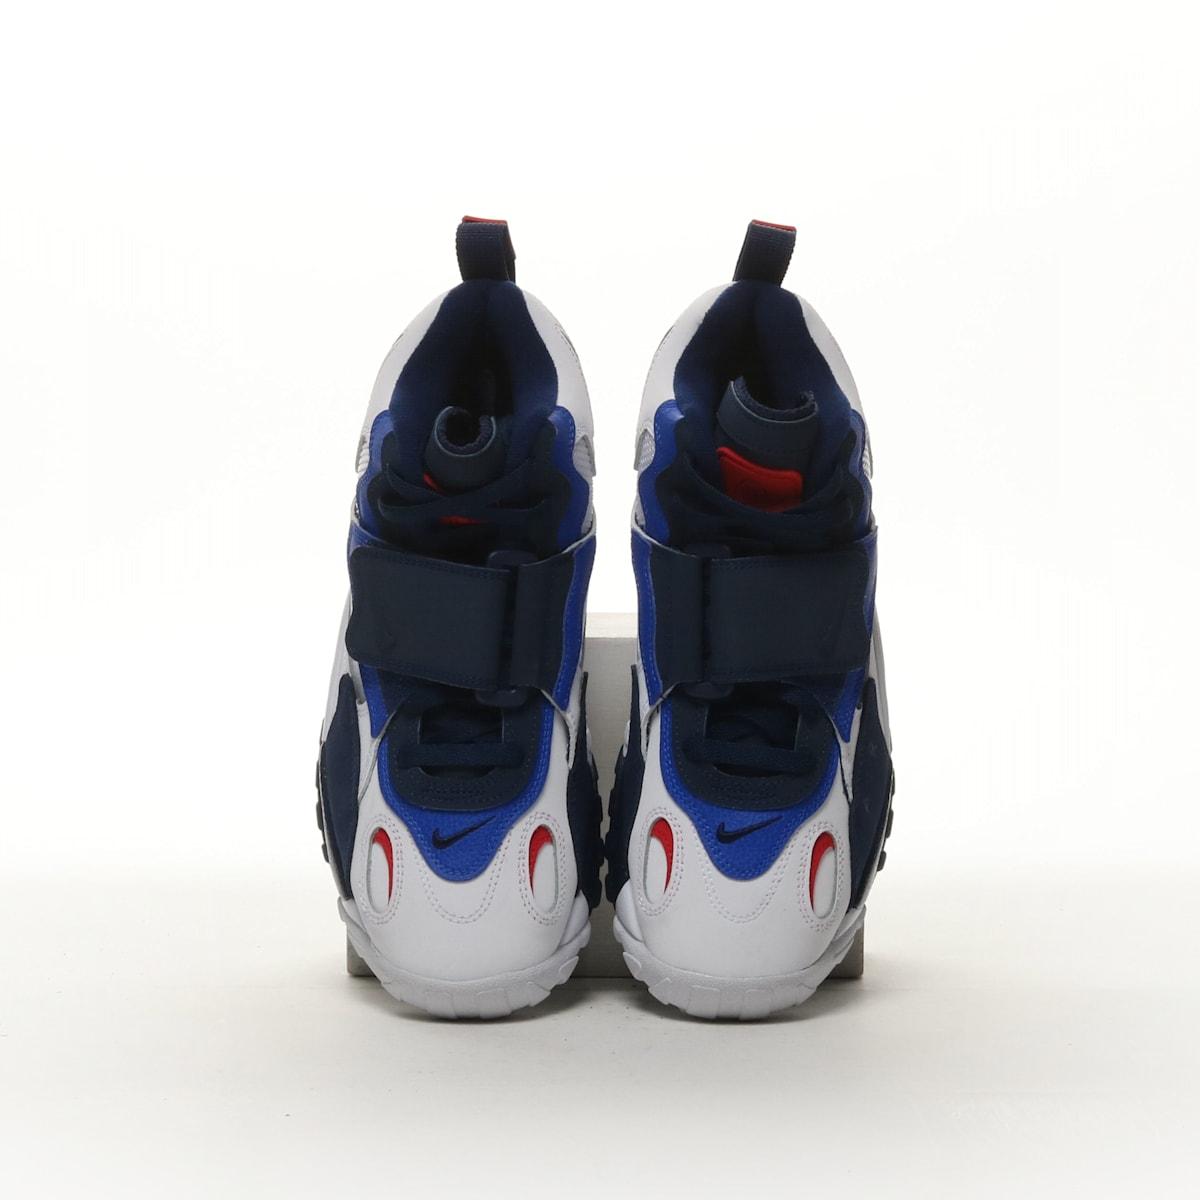 69140696e4 Nike Air Max Speed Turf - WHITE/BLUE VOID/RACER BLUE/UNIVERSITY RED ...